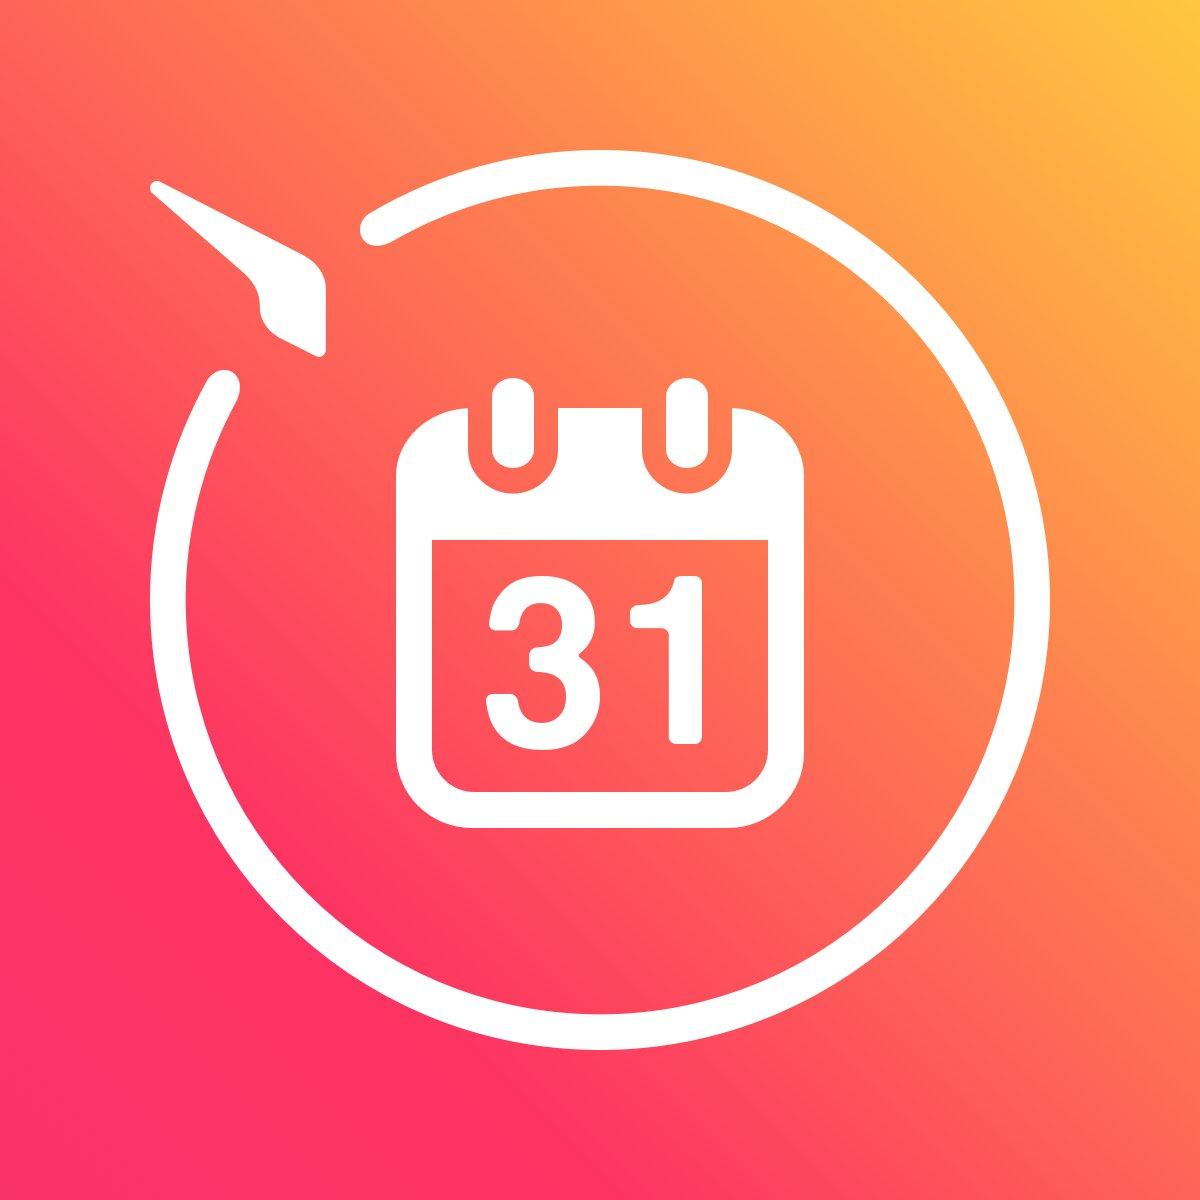 Shopify Events Calendar app by Elfsight